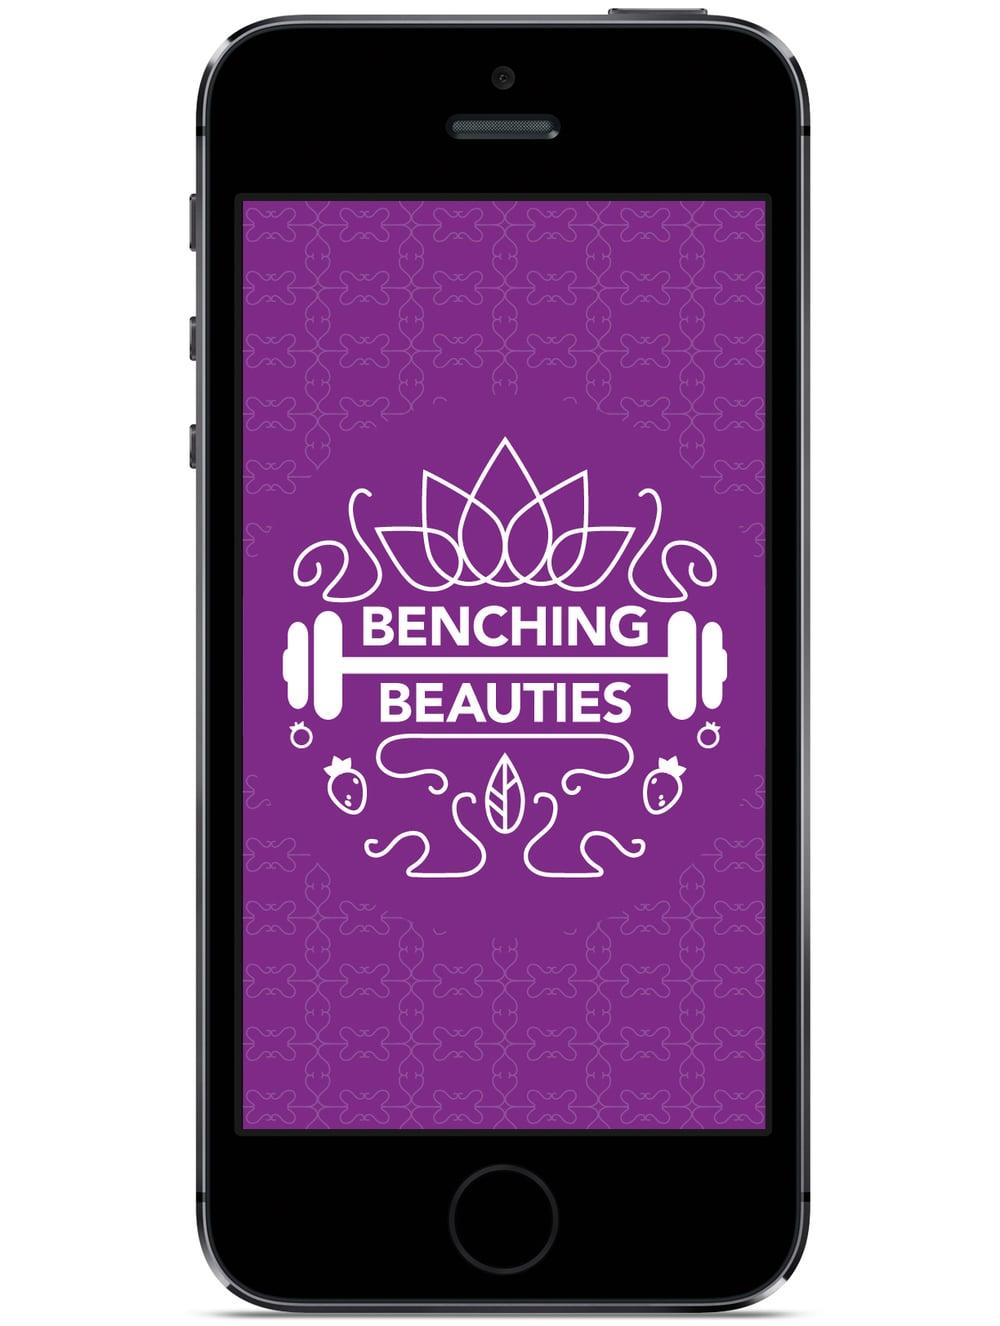 bb-iphone-mockup.jpg